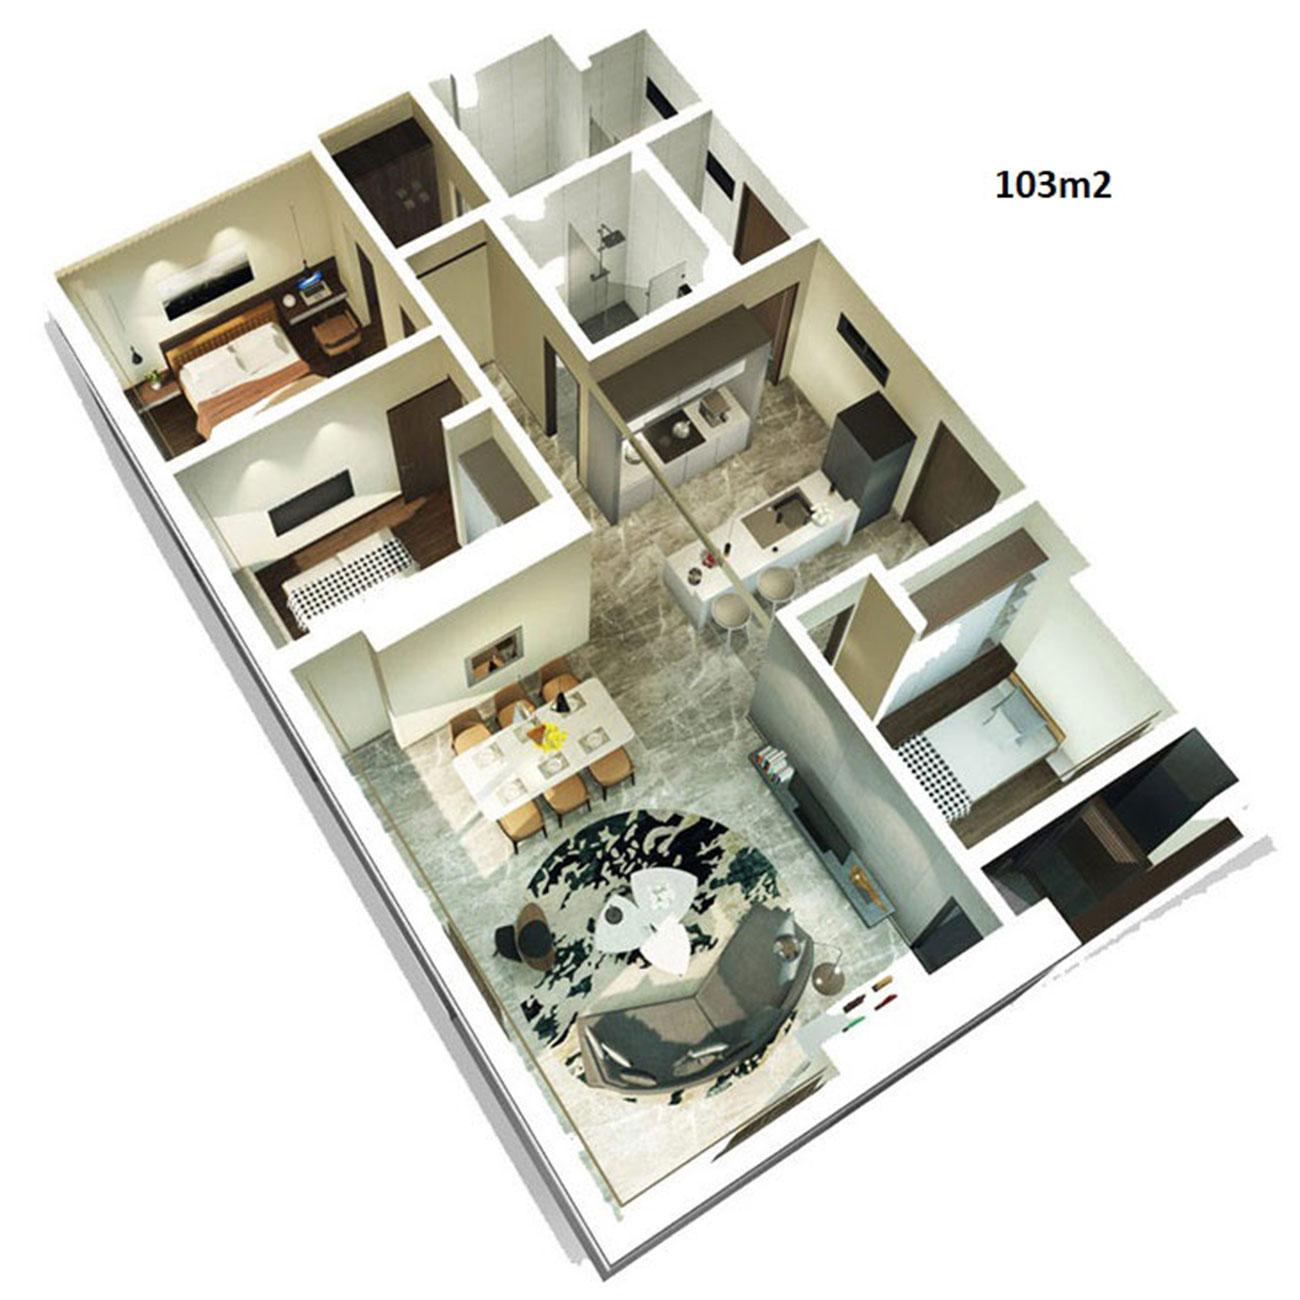 Thiết kế chi tiết căn hộ Kingdom 101 diện tích 103 m2